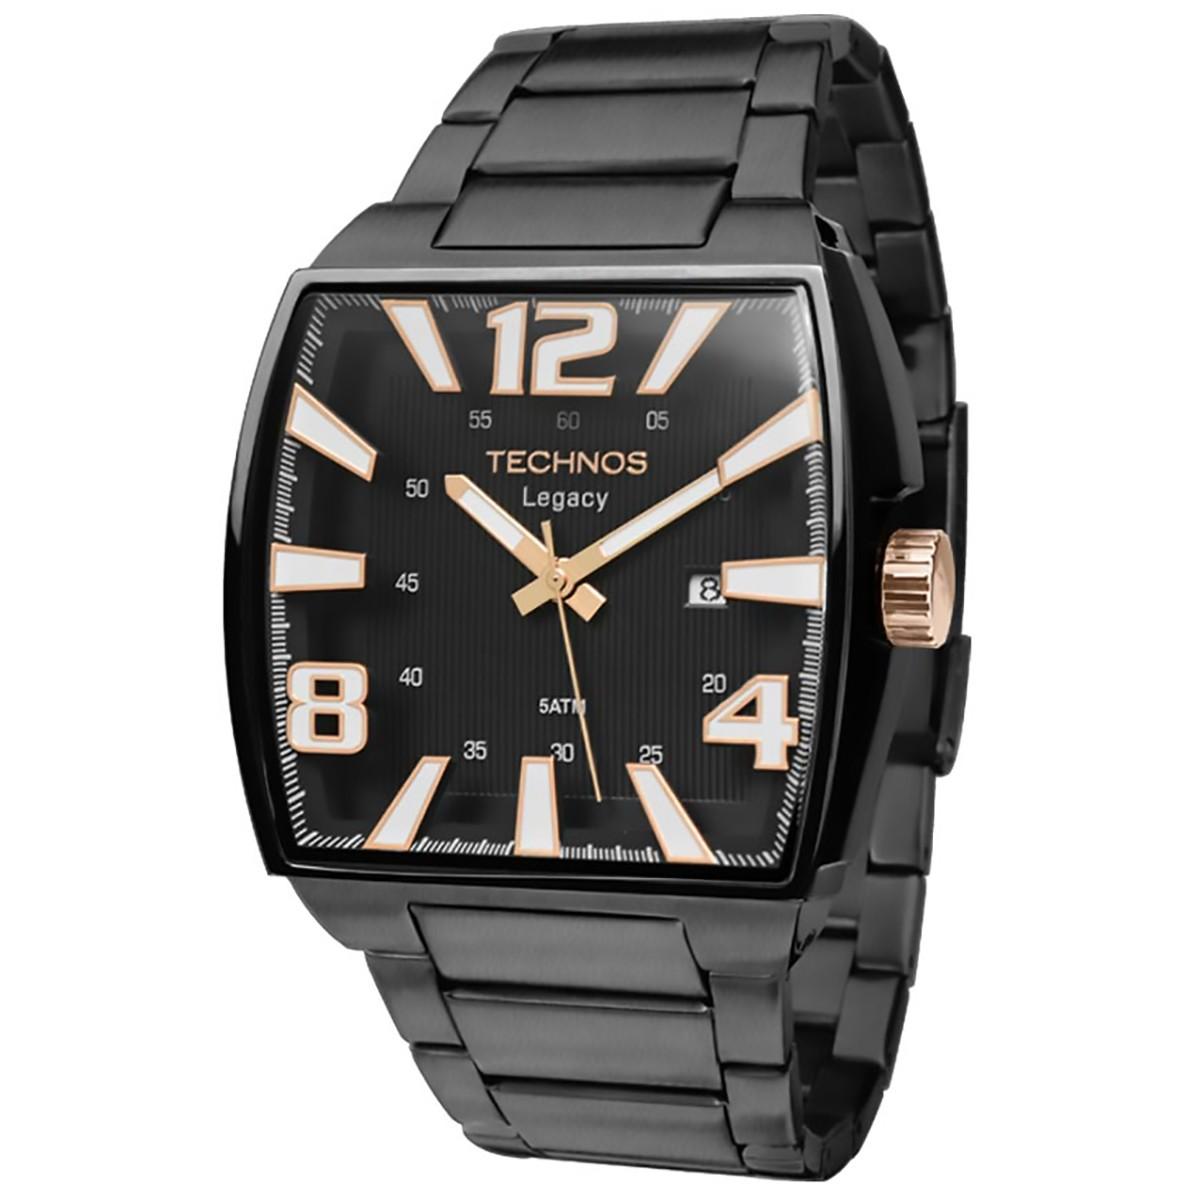 46b8c0f7337d6 Compre Relógio Technos Legacy em 10X   Tri-Jóia Shop